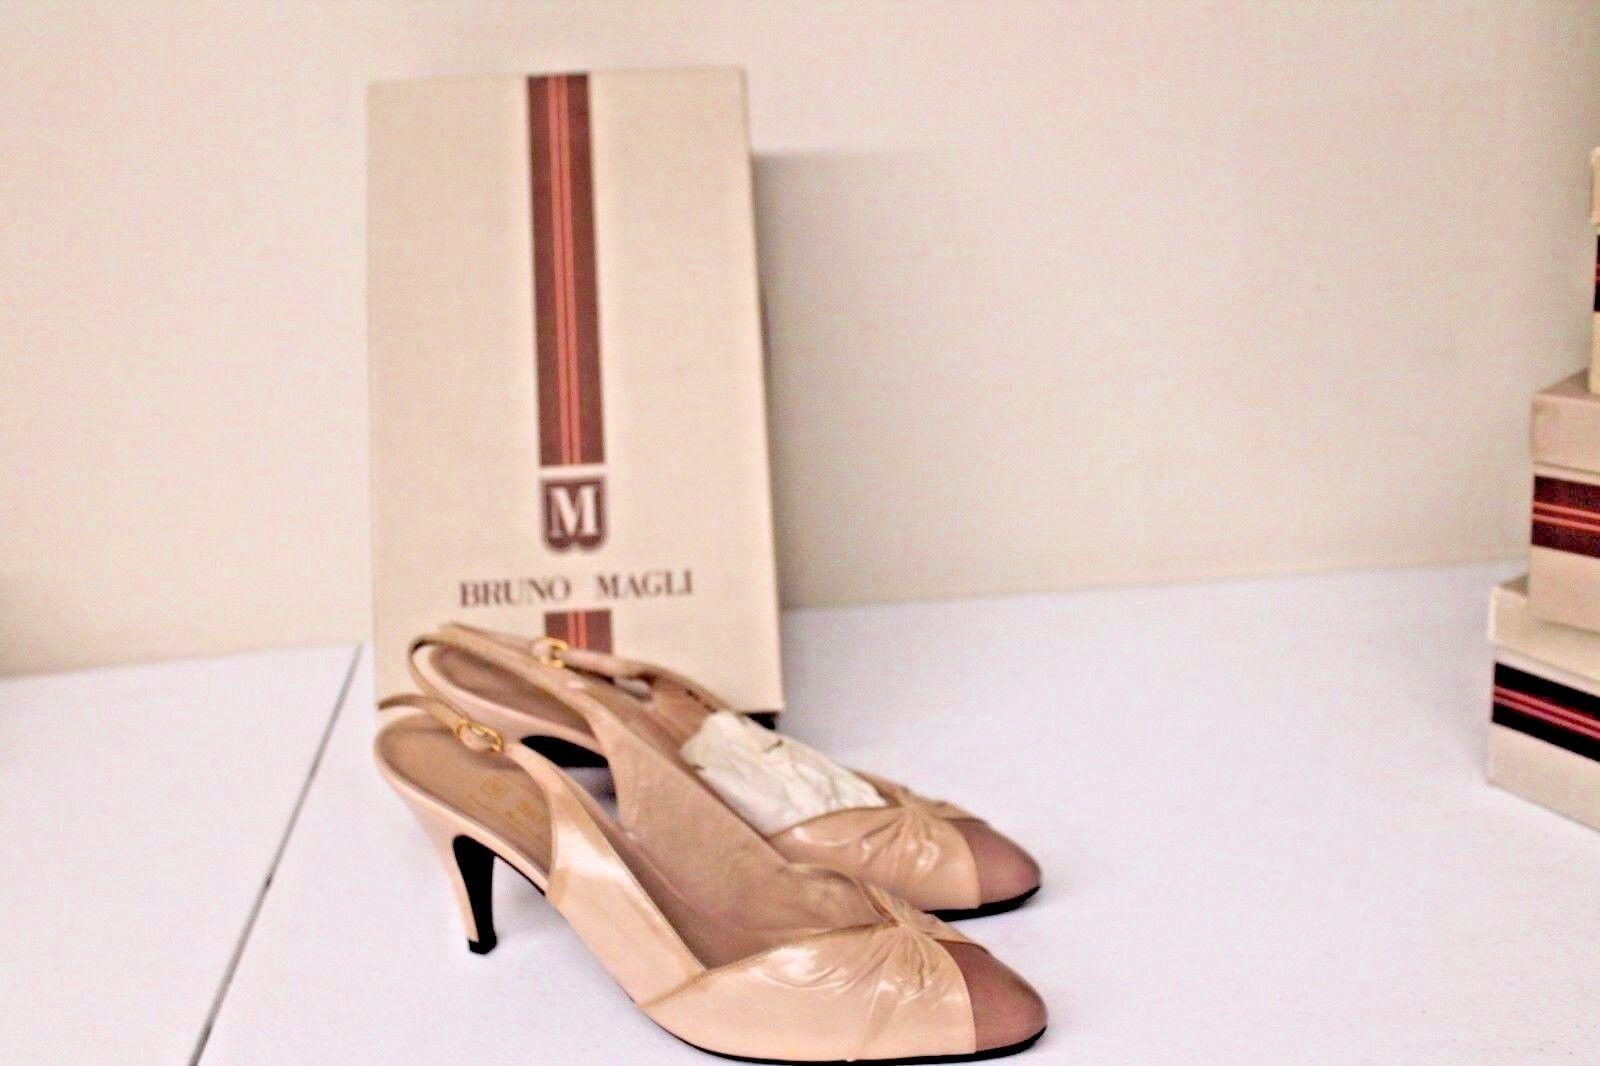 Womens 8.5 AAAA Bruno Magli Sand Leather Open toe Heels Pumps